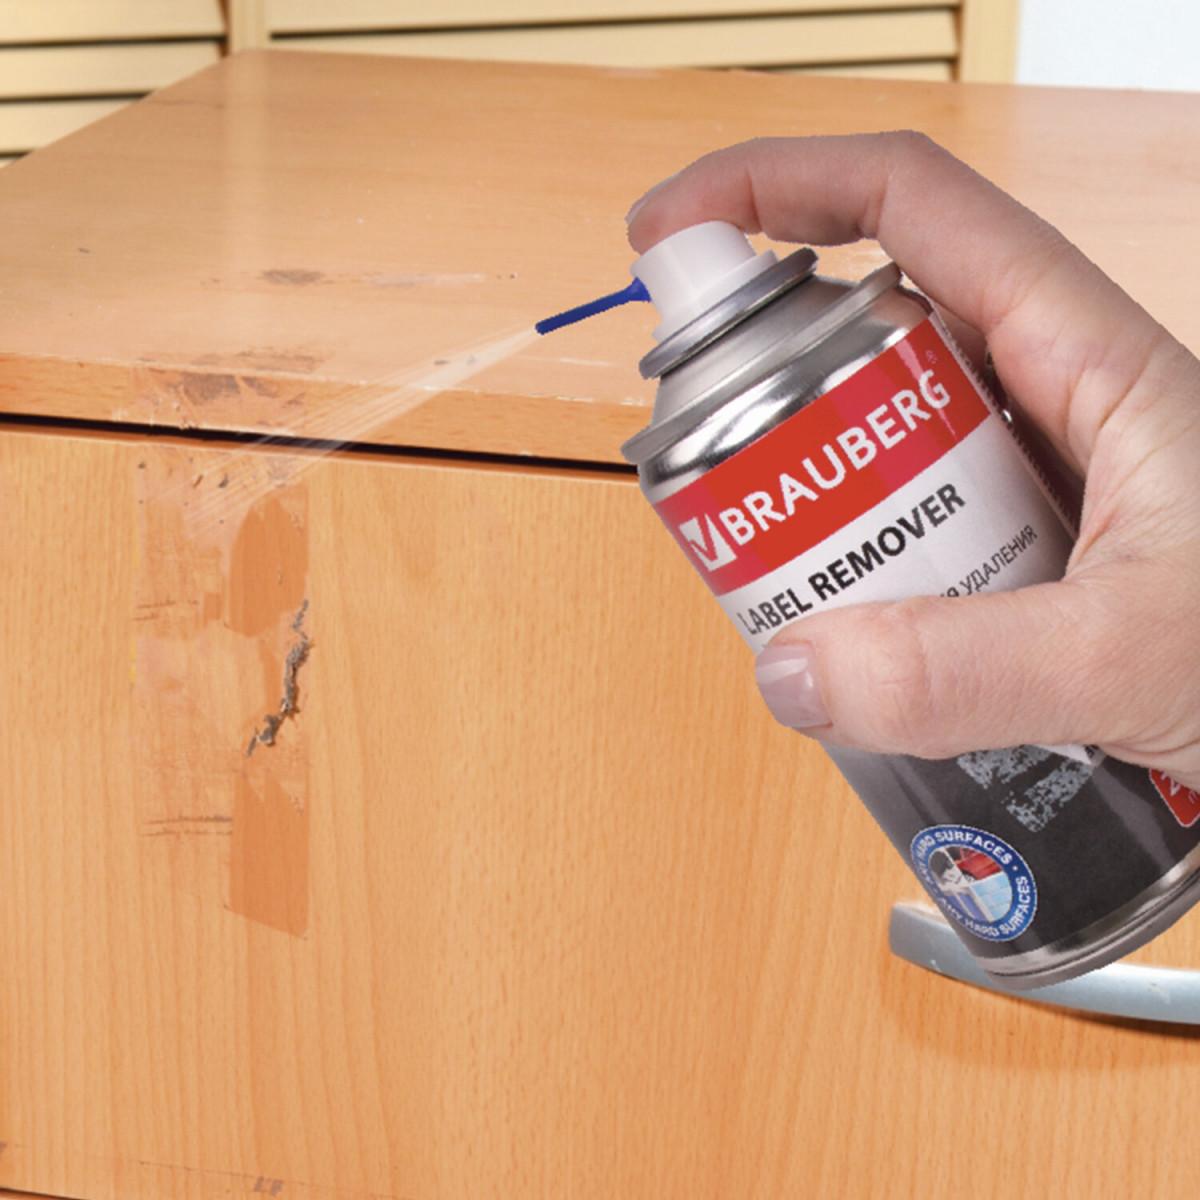 Антискотч спрей для удаления этикеток, следов клея и липких лент, BRAUBERG MAX, 210 мл, 607163